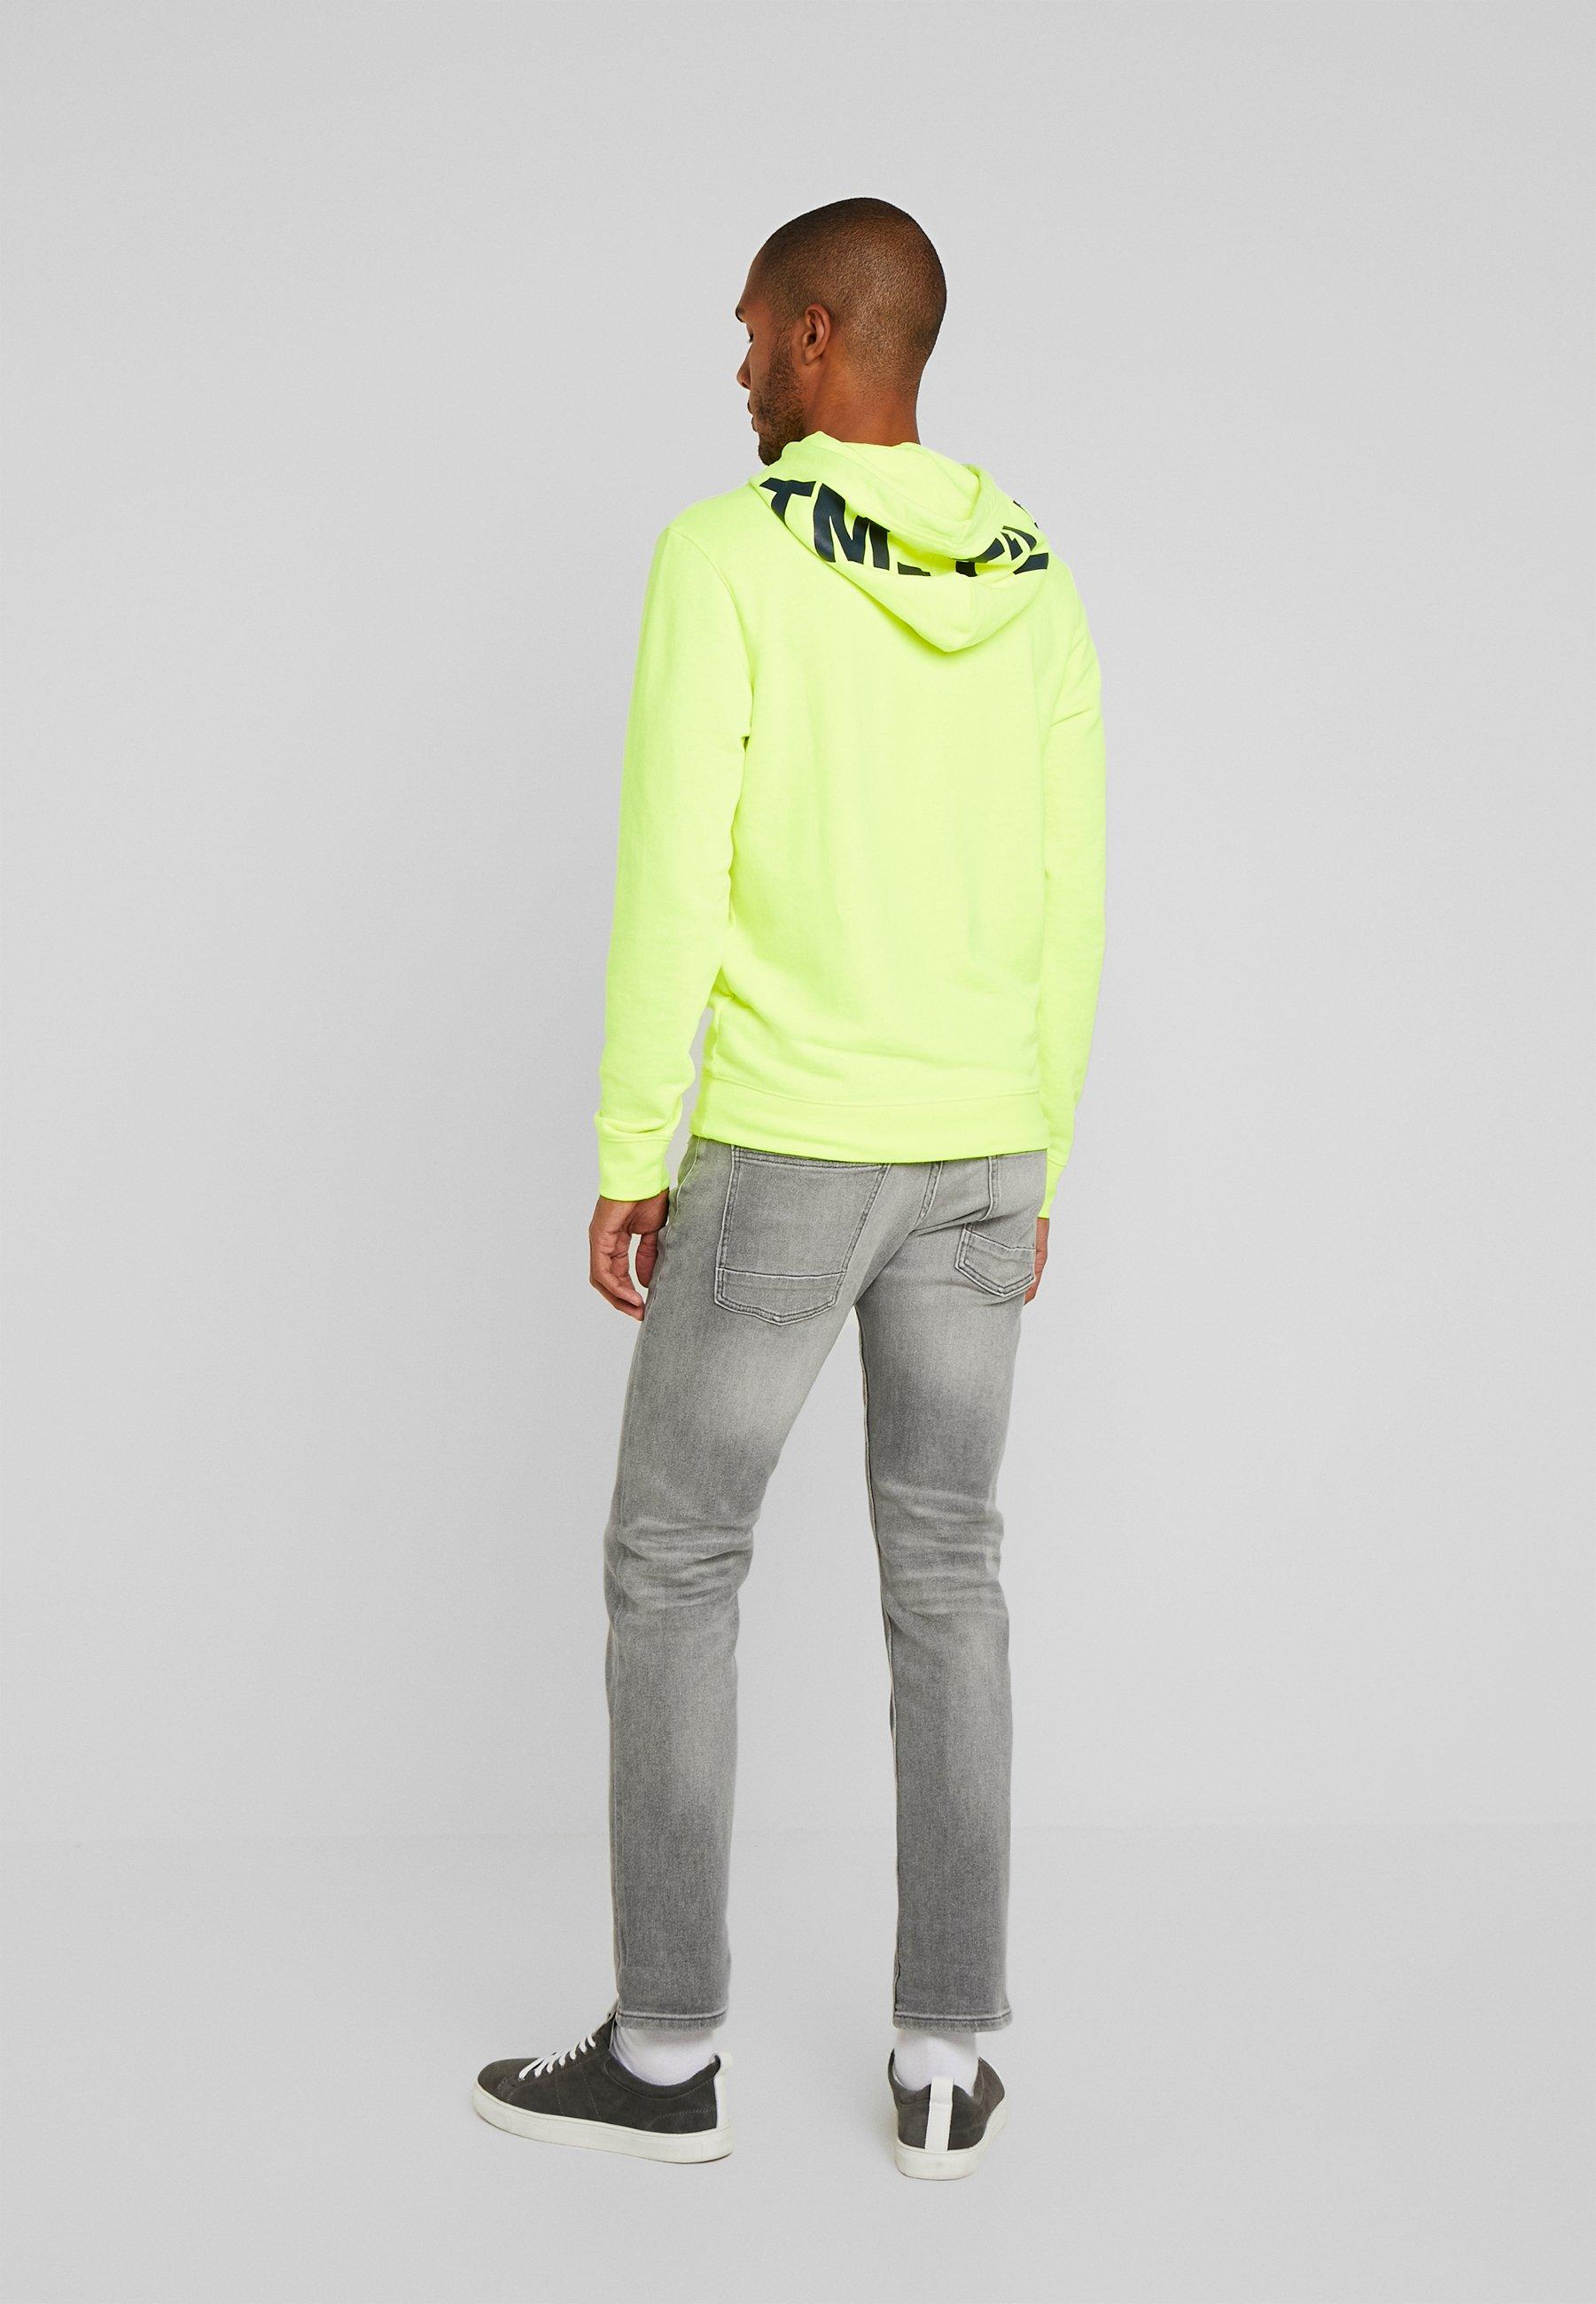 TOM TAILOR JOSH - Straight leg jeans - used light stone grey denim